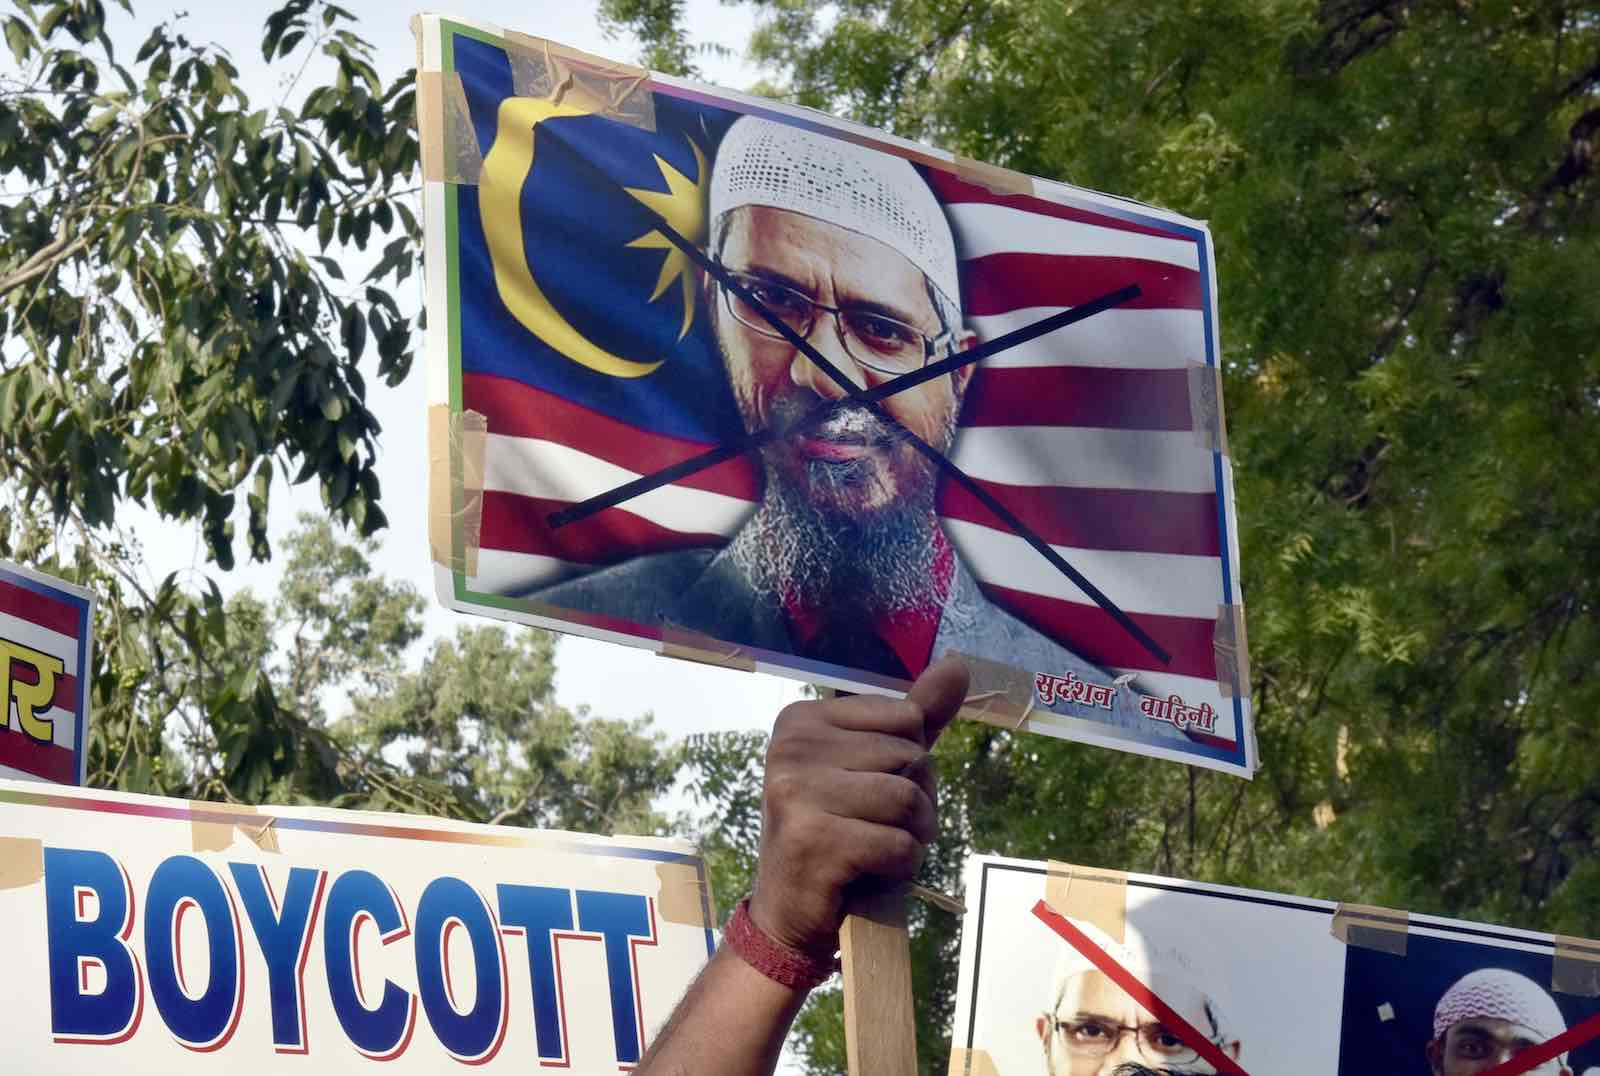 A 2018 protest in New Delhi against Islamic preacher Zakir Naik and the Malaysian government (Photo: Sonu Mehta via Getty)